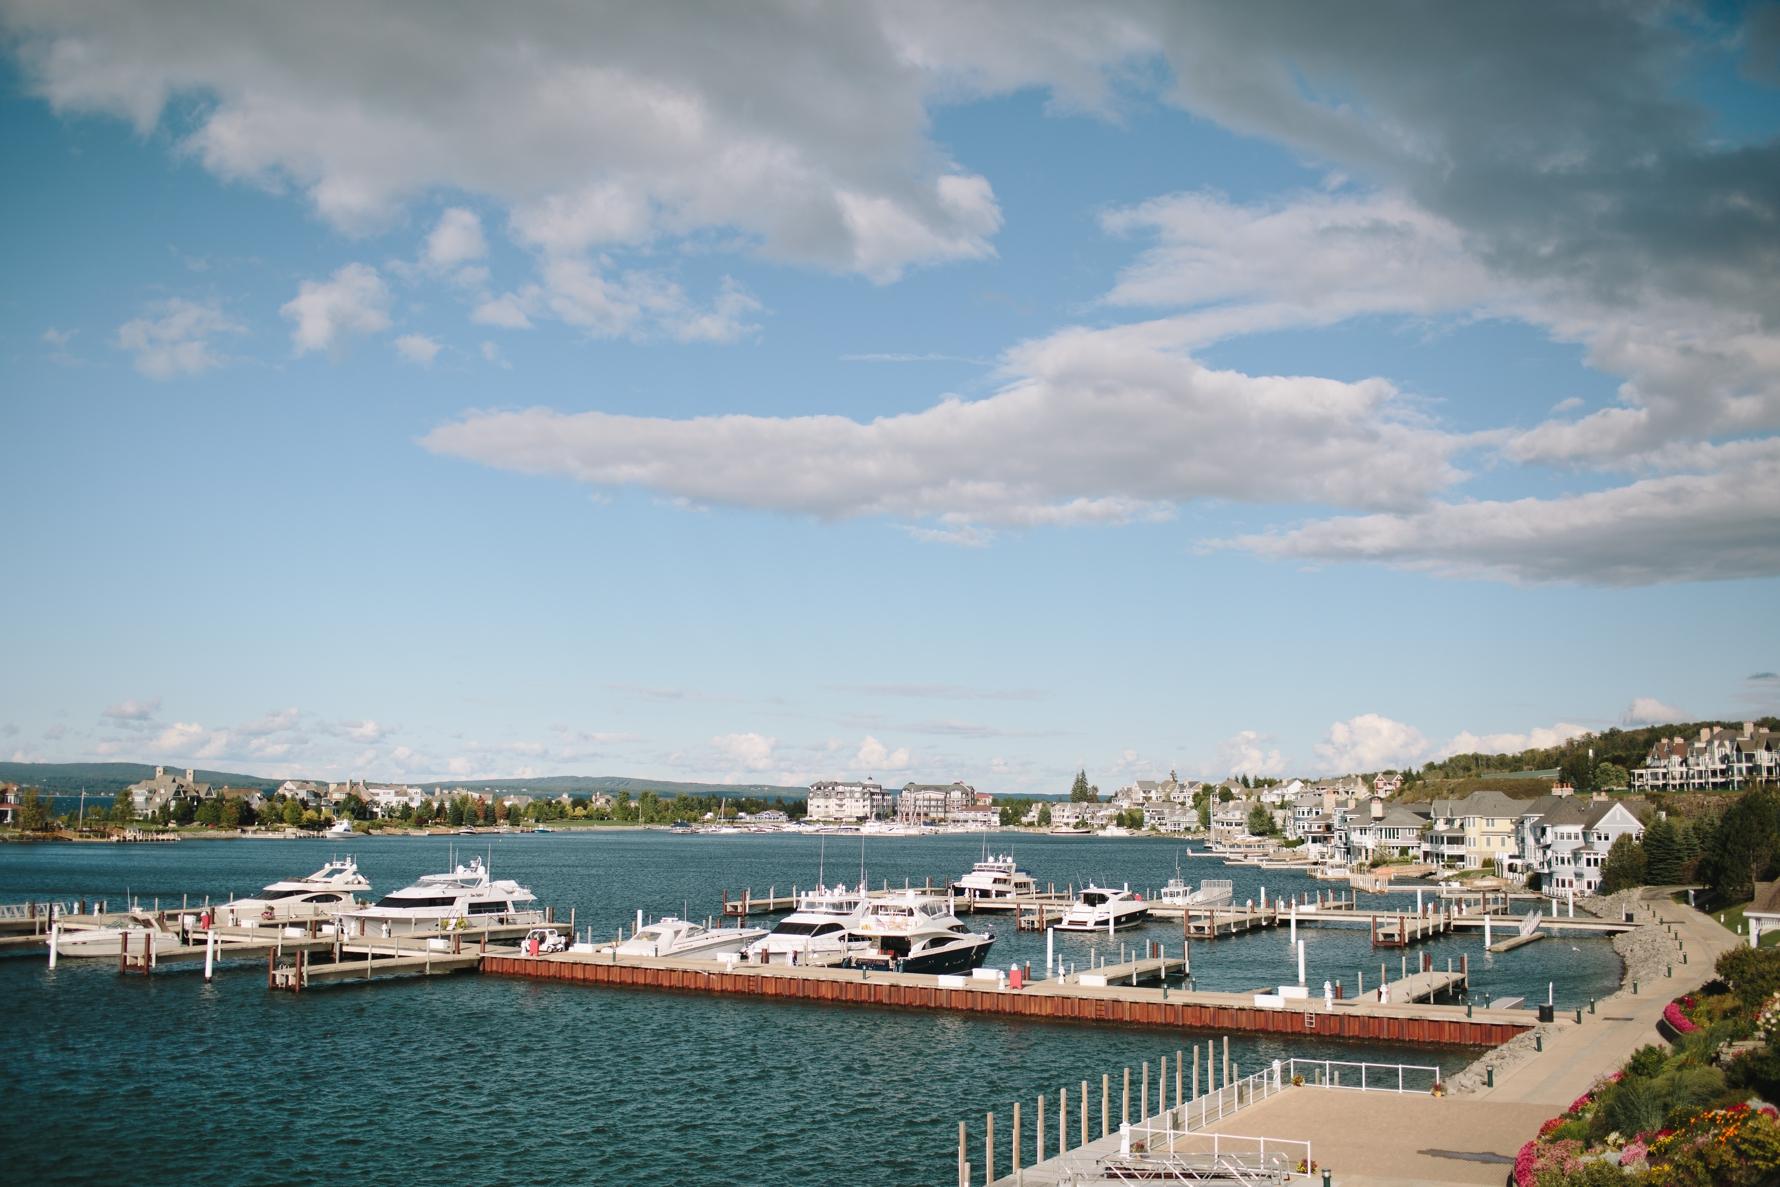 Bay Harbor Yacht Club 059.JPG